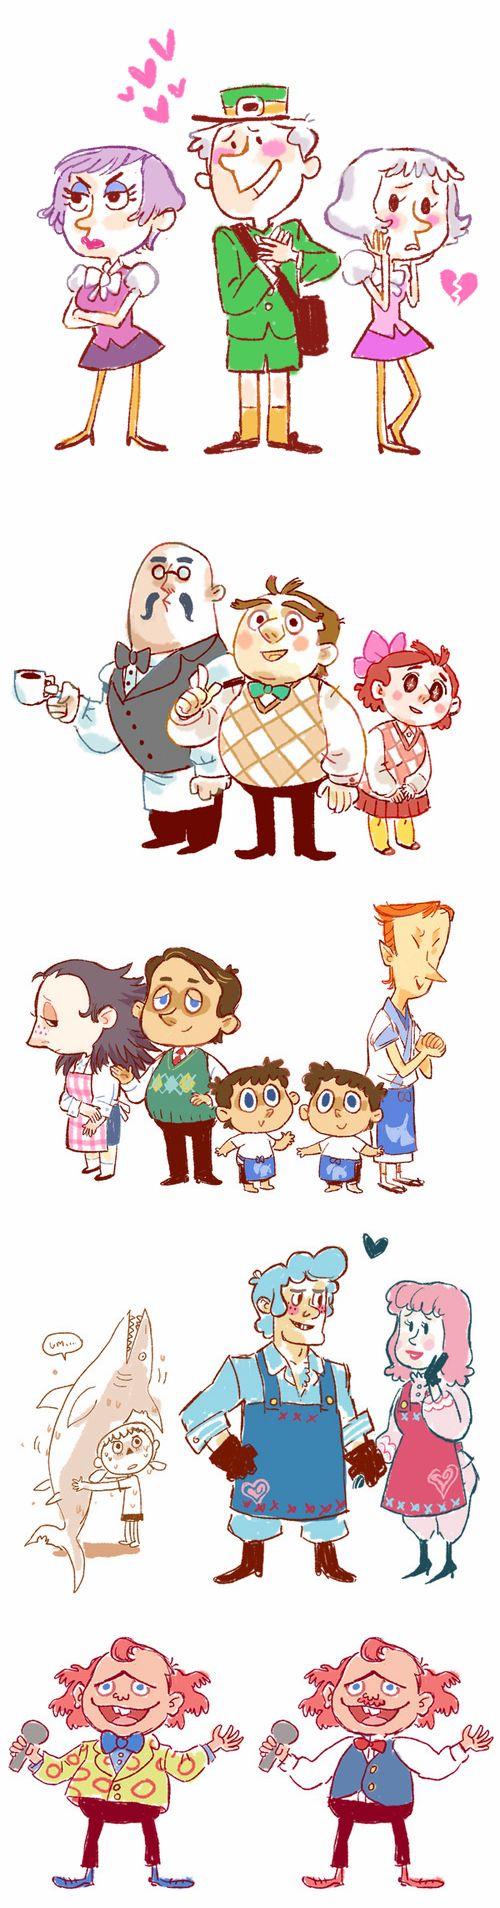 Human Crossing (Animal Crossing Gijinkas)